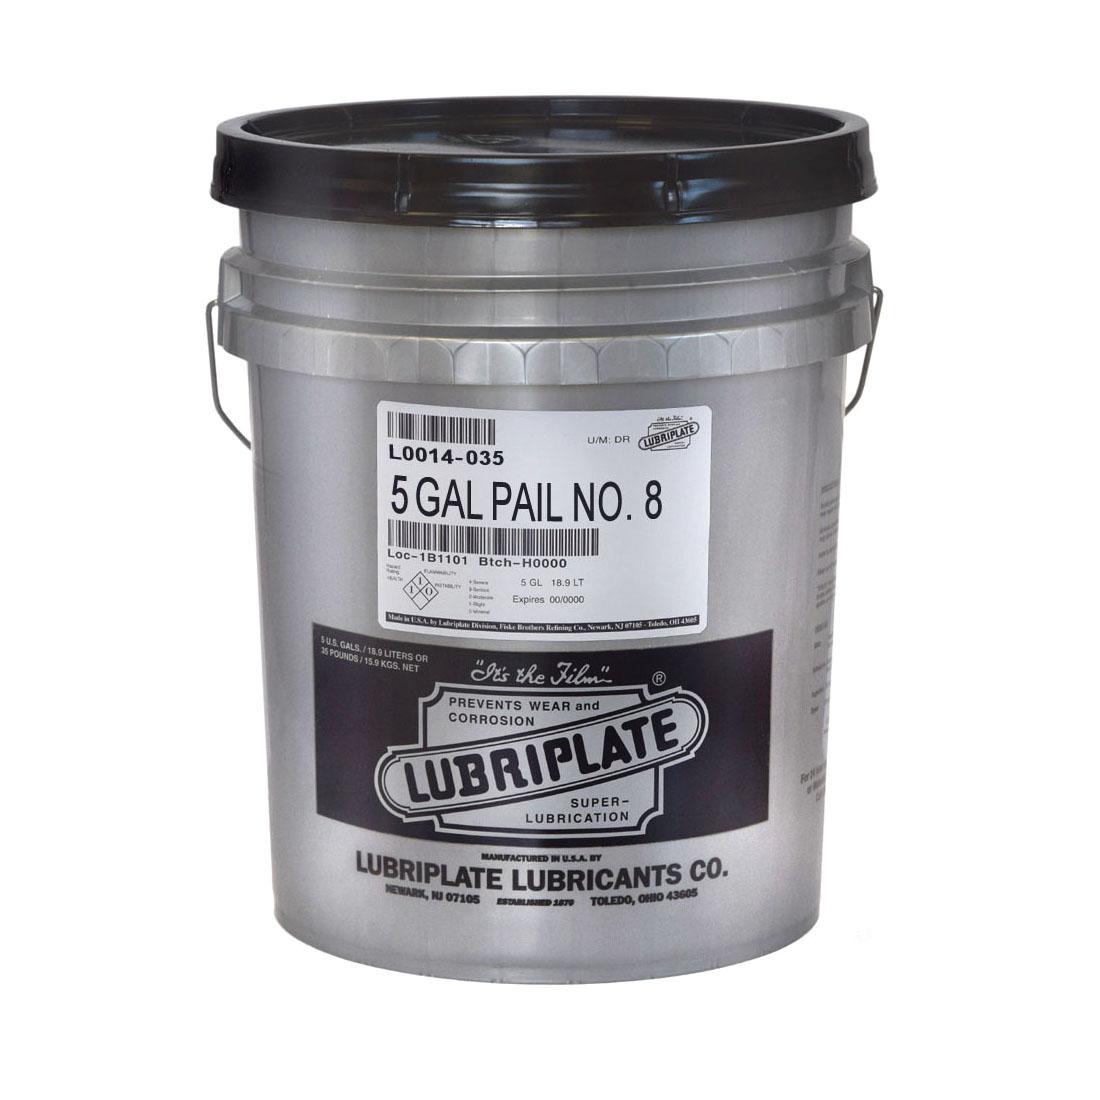 Lubriplate® L0014-035 NO 8 Petroleum Based Machine Oil, 35 lb Pail, Mineral Oil Odor/Scent, Liquid Form, Amber